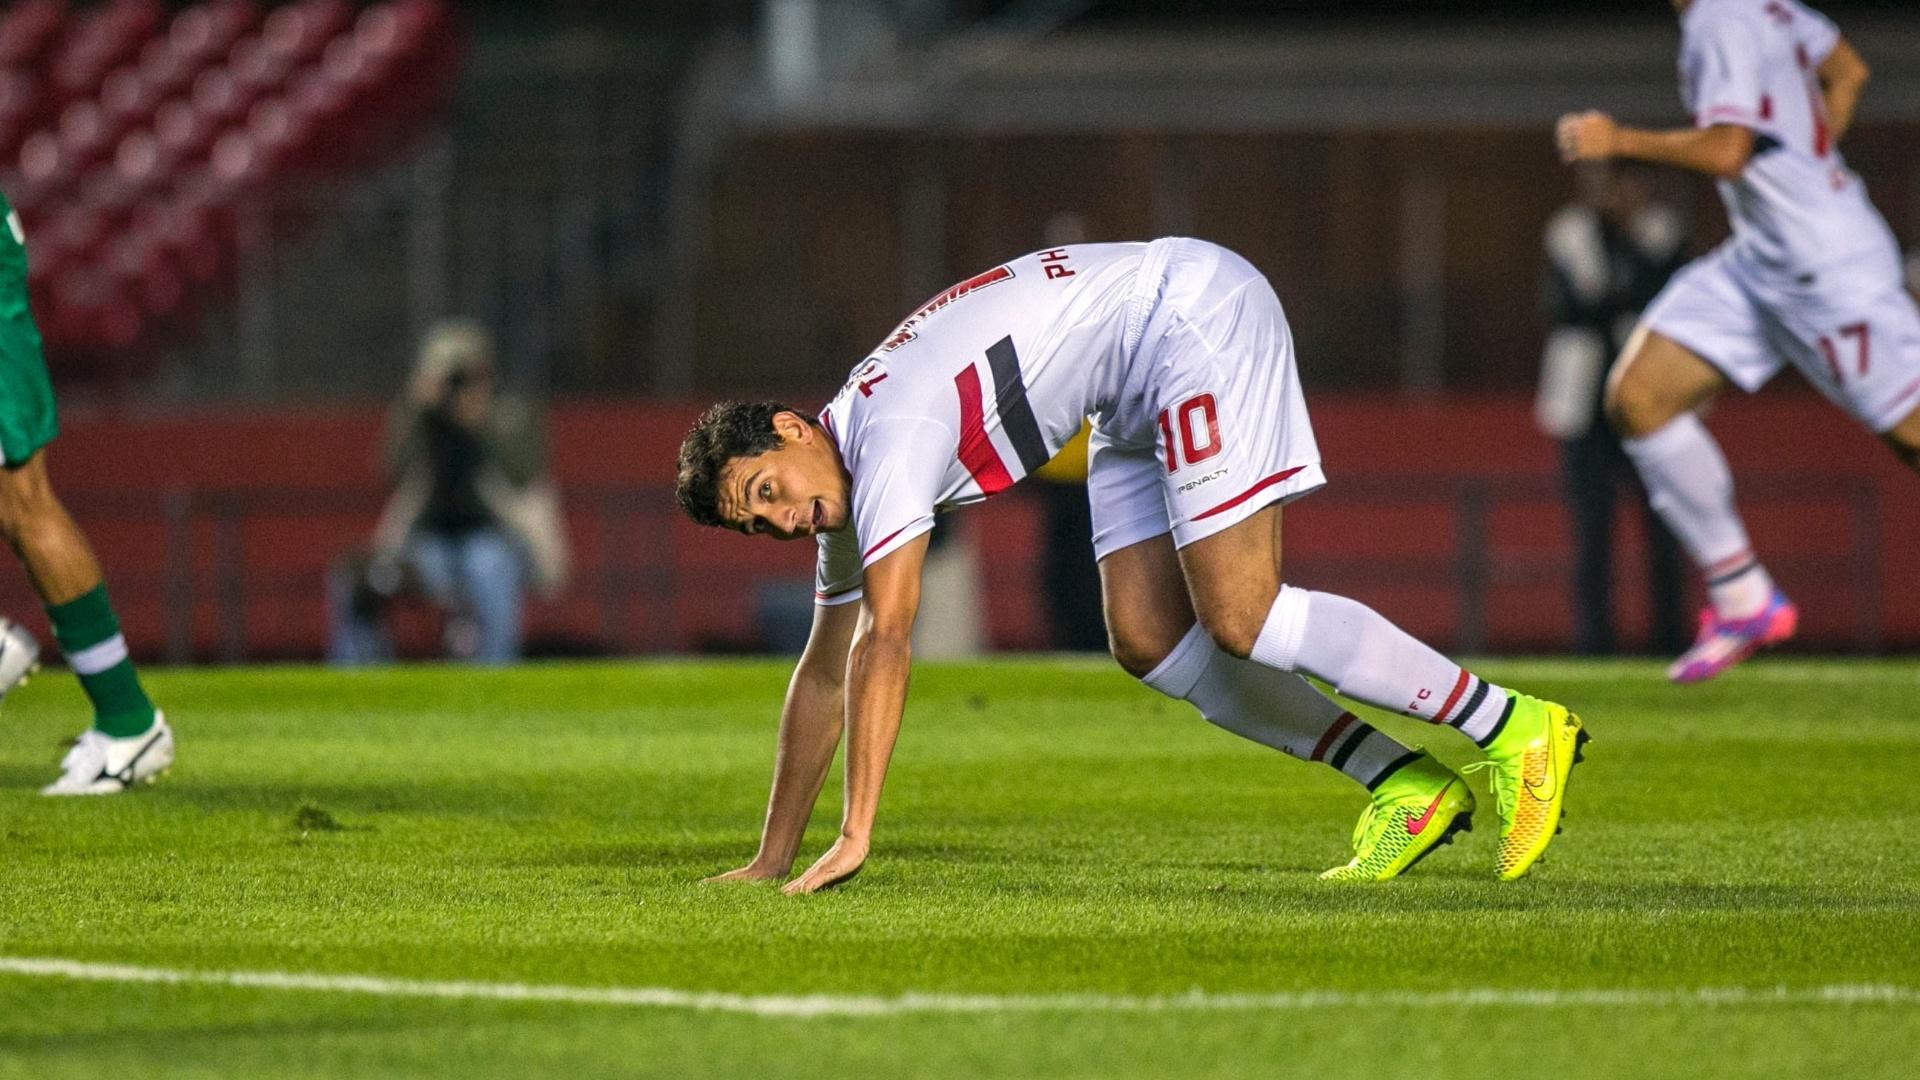 Paulo Henrique Ganso tenta se levantar durante jogo entre São Paulo e  Chapecoense no Morumbi 0c013d4e33d82